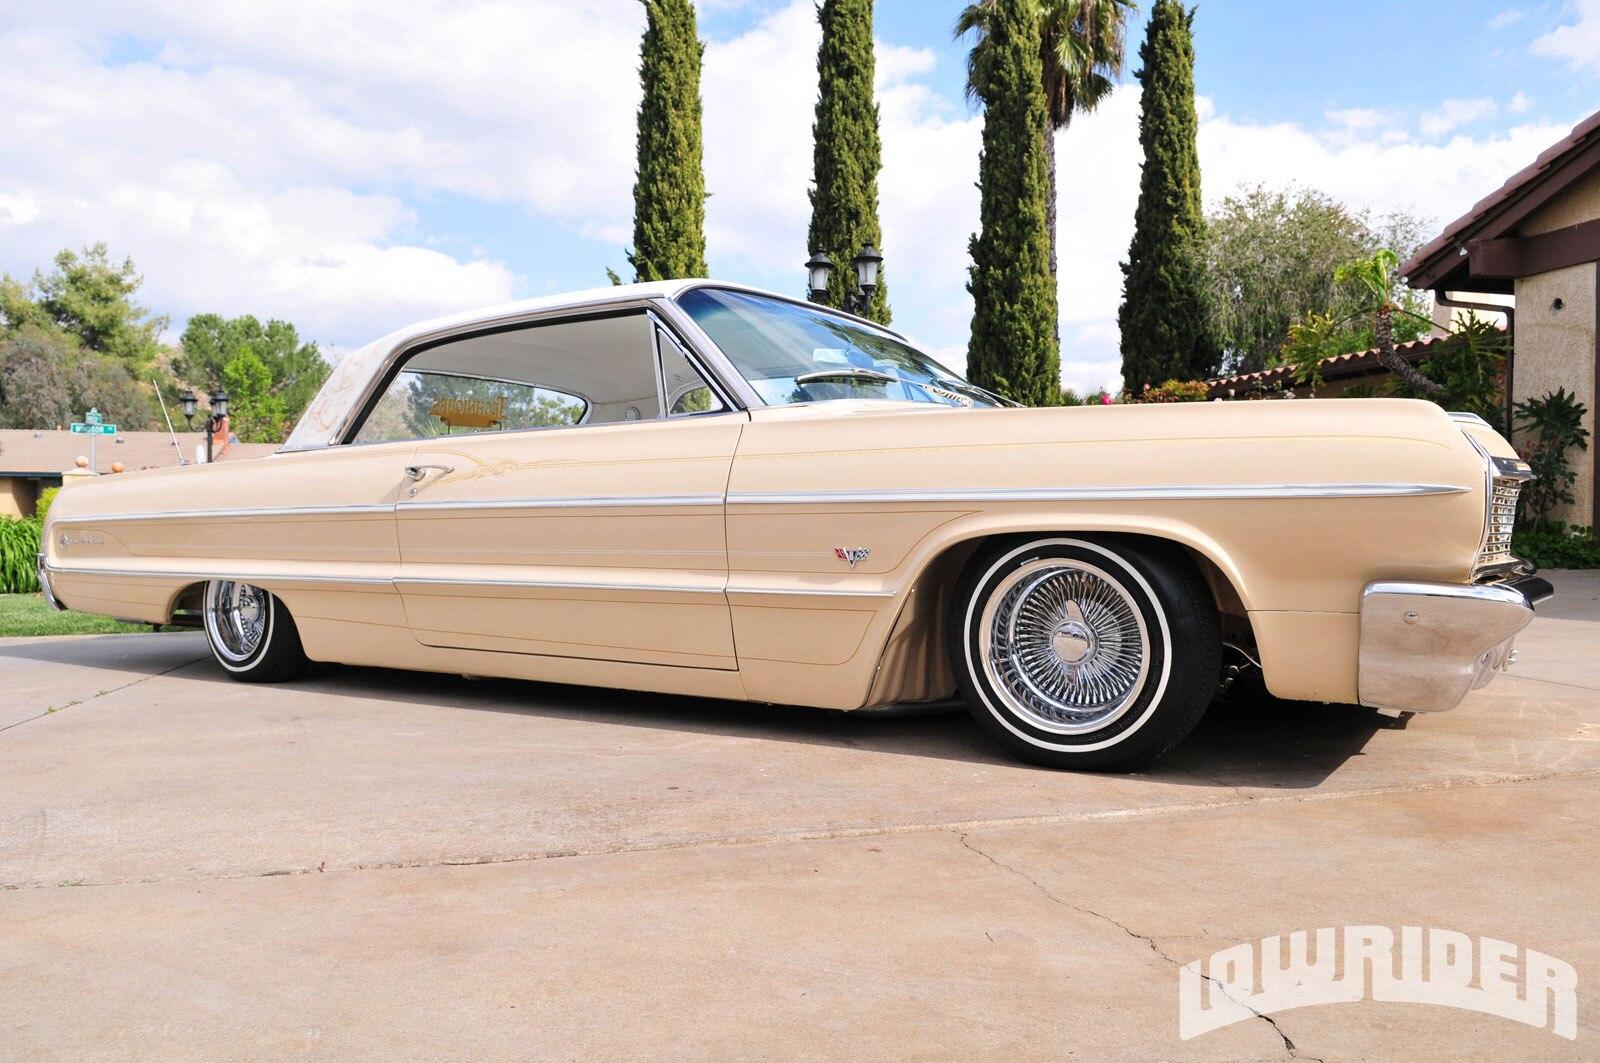 1964 Chevrolet Impala - Lowrider Magazine